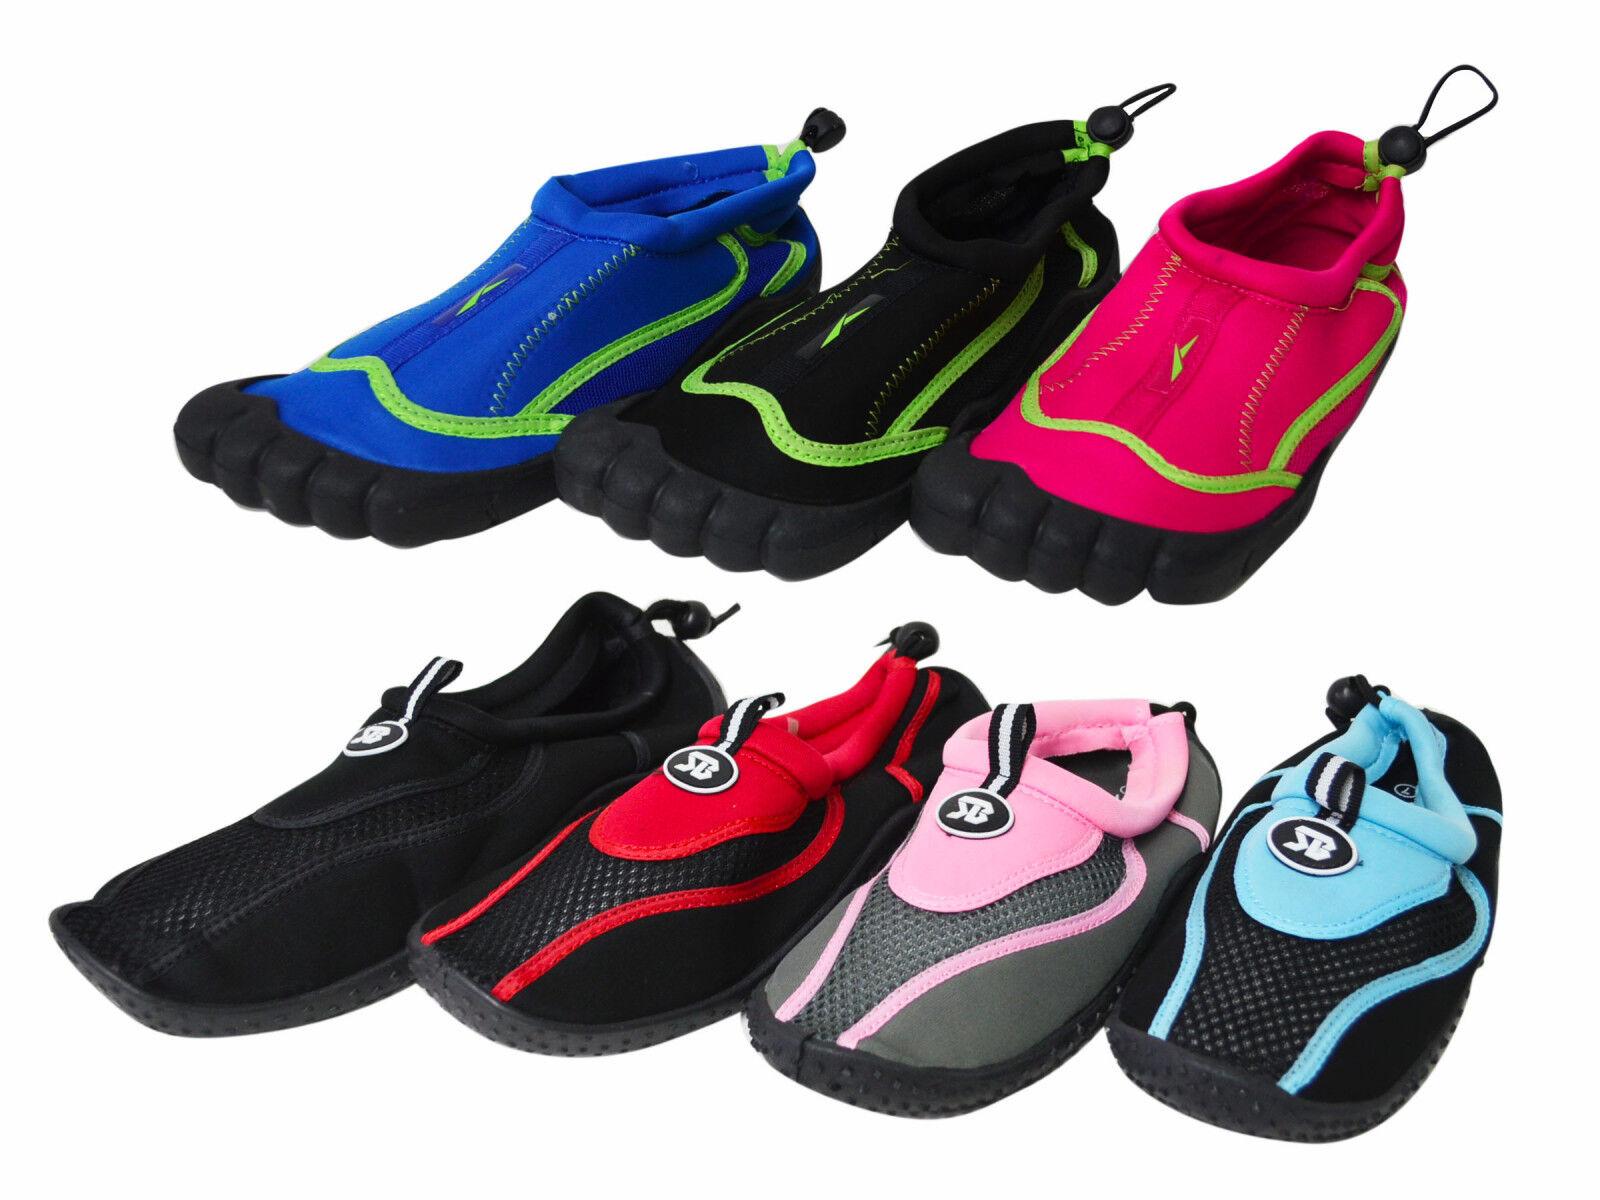 Men's Water Shoes Aqua Socks Snorkeling Pool Beach Exercise ...